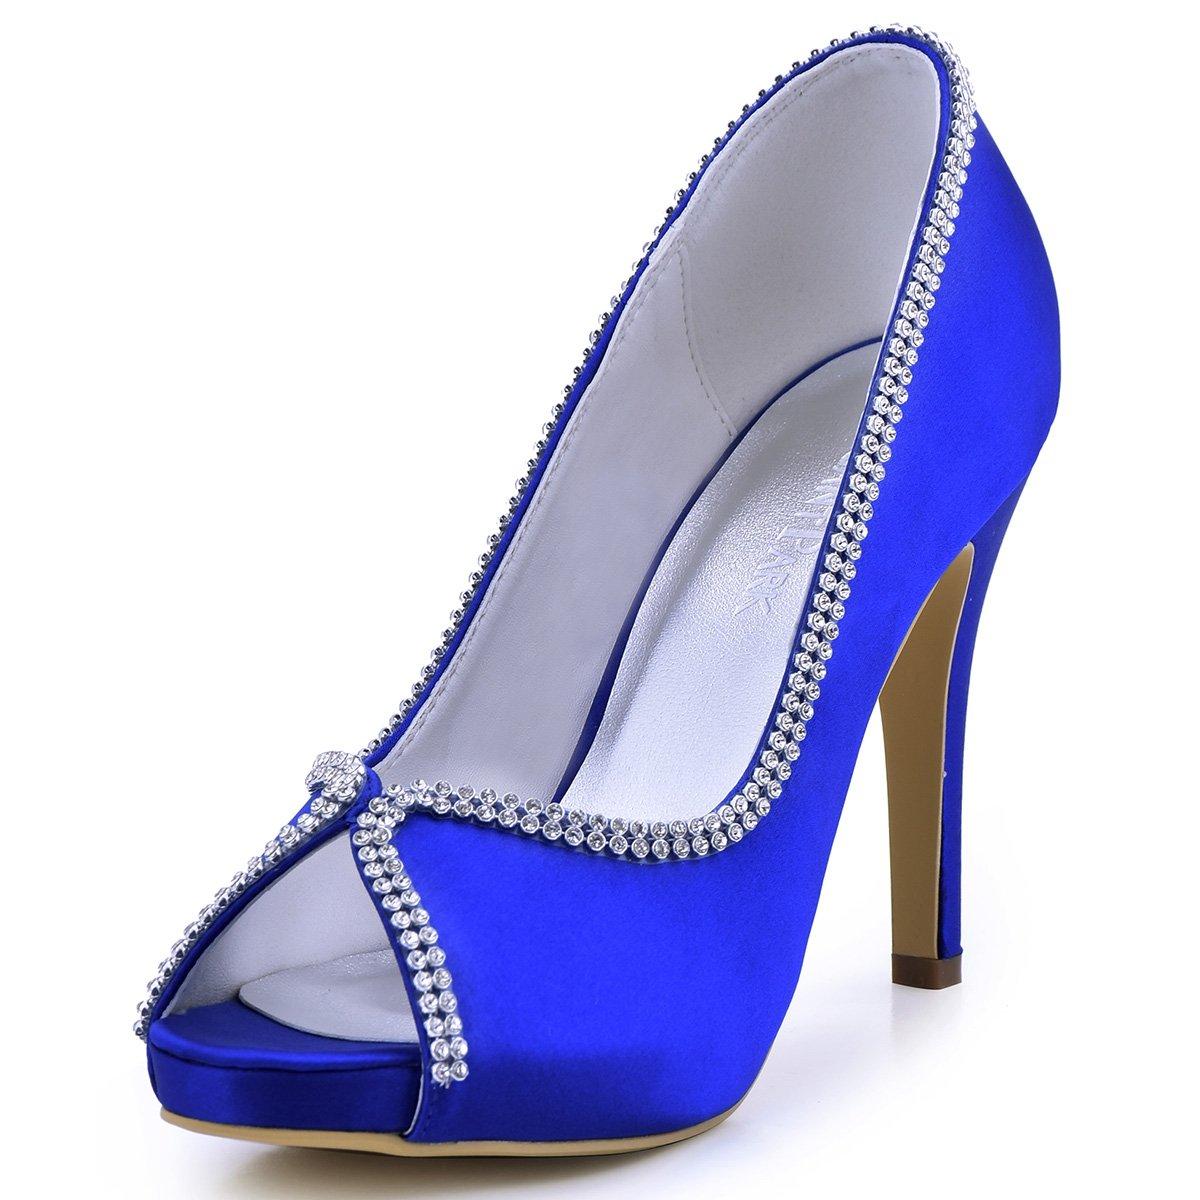 ElegantPark EP11083 Women Pumps Peep Toe Rhinestones Platform High Heel Satin Evening Wedding Dress Shoes B00ARD1TBO 5 B(M) US (true fitting 6 US)|Blue